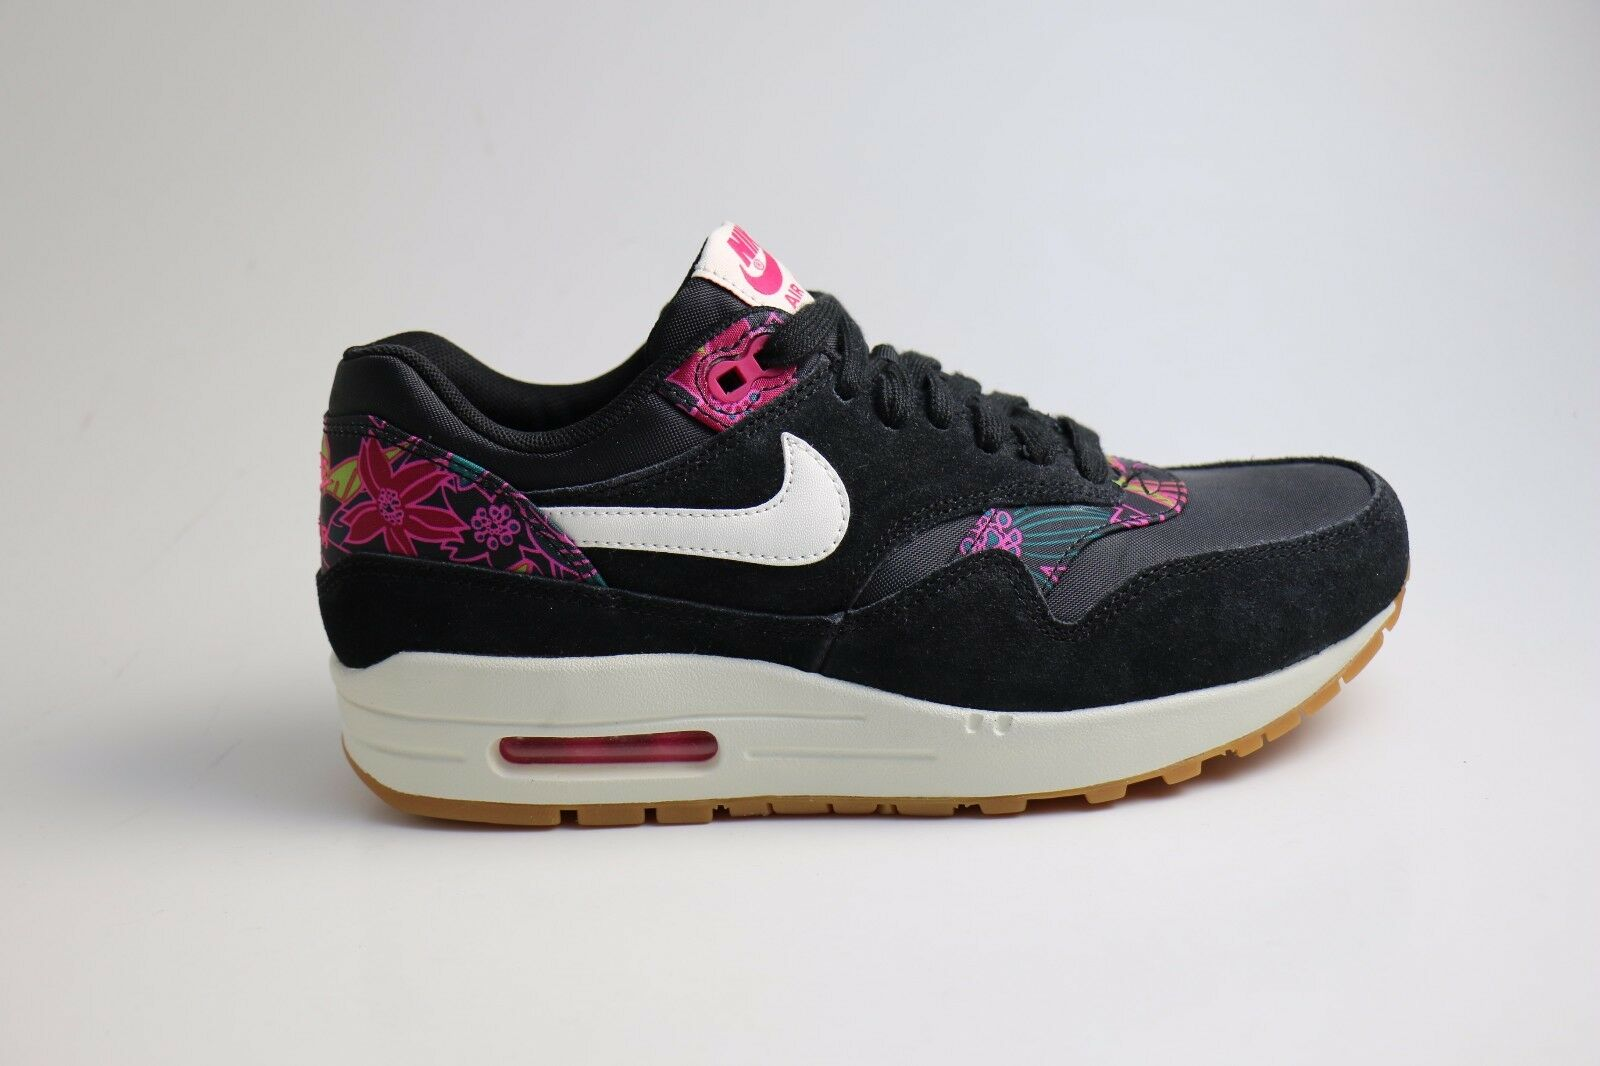 Nike Wmns Bir Max 1 Bloha Pack Black Pink EUR 37,5 US 6,5  528898 004